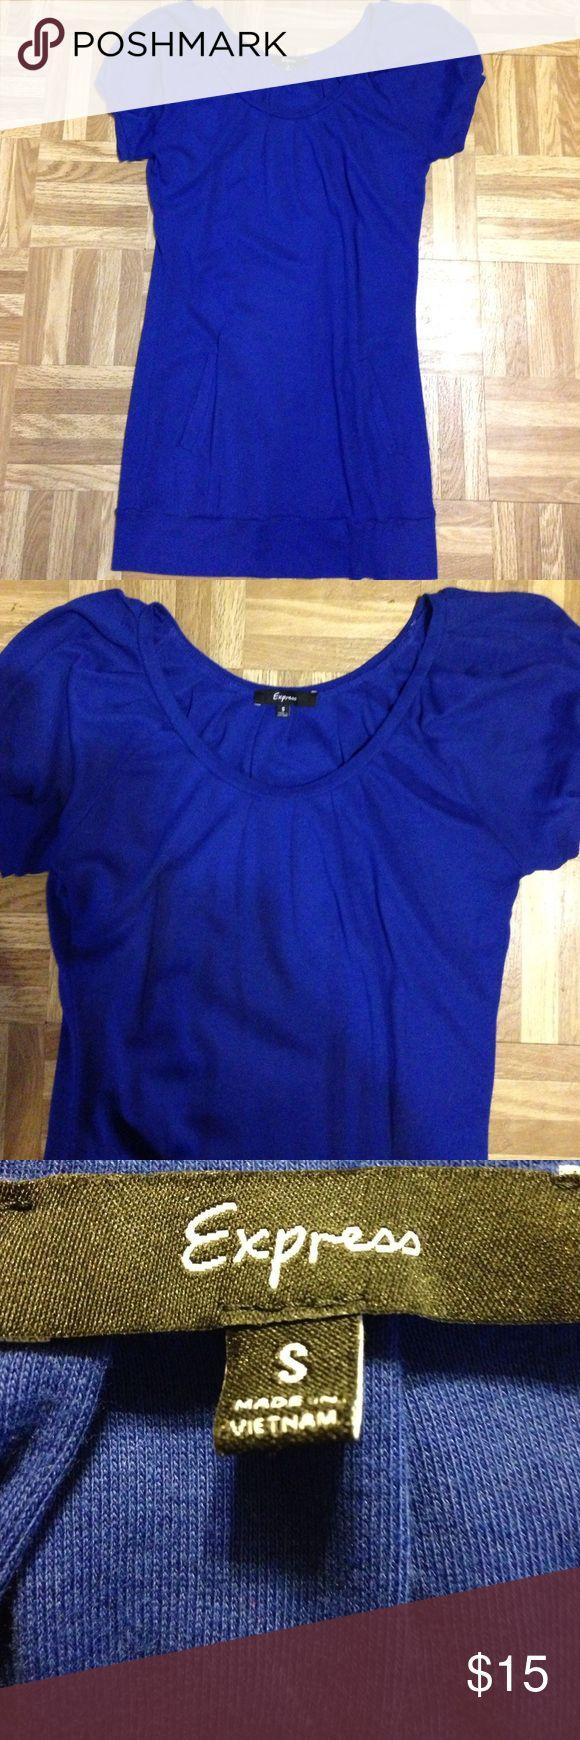 Really pretty tunic top by Express sz S Really pretty tunic top by Express sz S. Beautiful blue. Banded bottom   Kangaroo pocket.  Like new condition. Express Tops Tunics